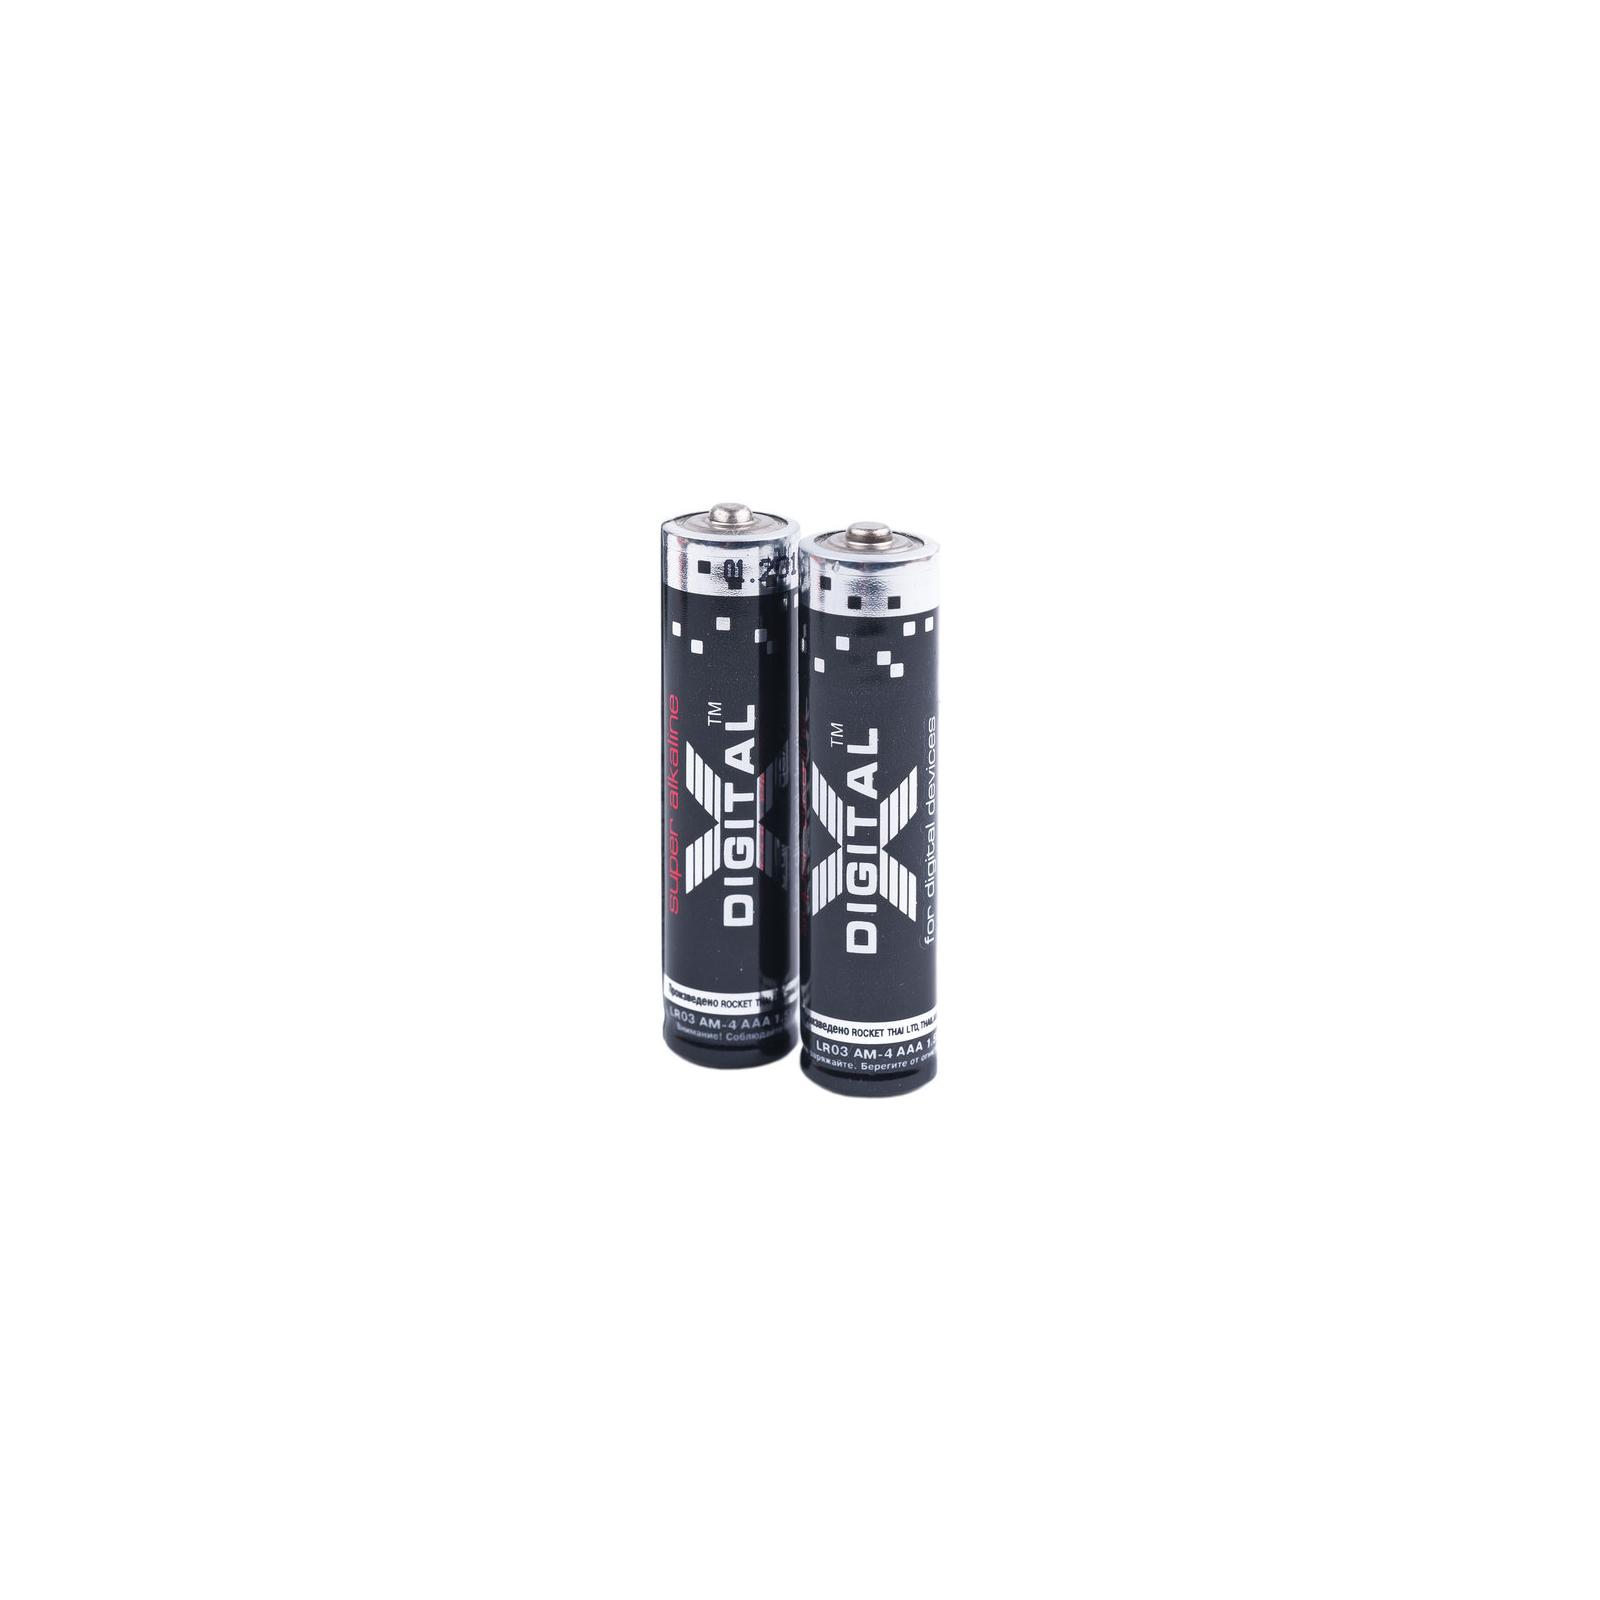 Батарейка X-DIGITAL LR03 X-DIGITAL * 2 (LR03 2BL X-Digital) изображение 2